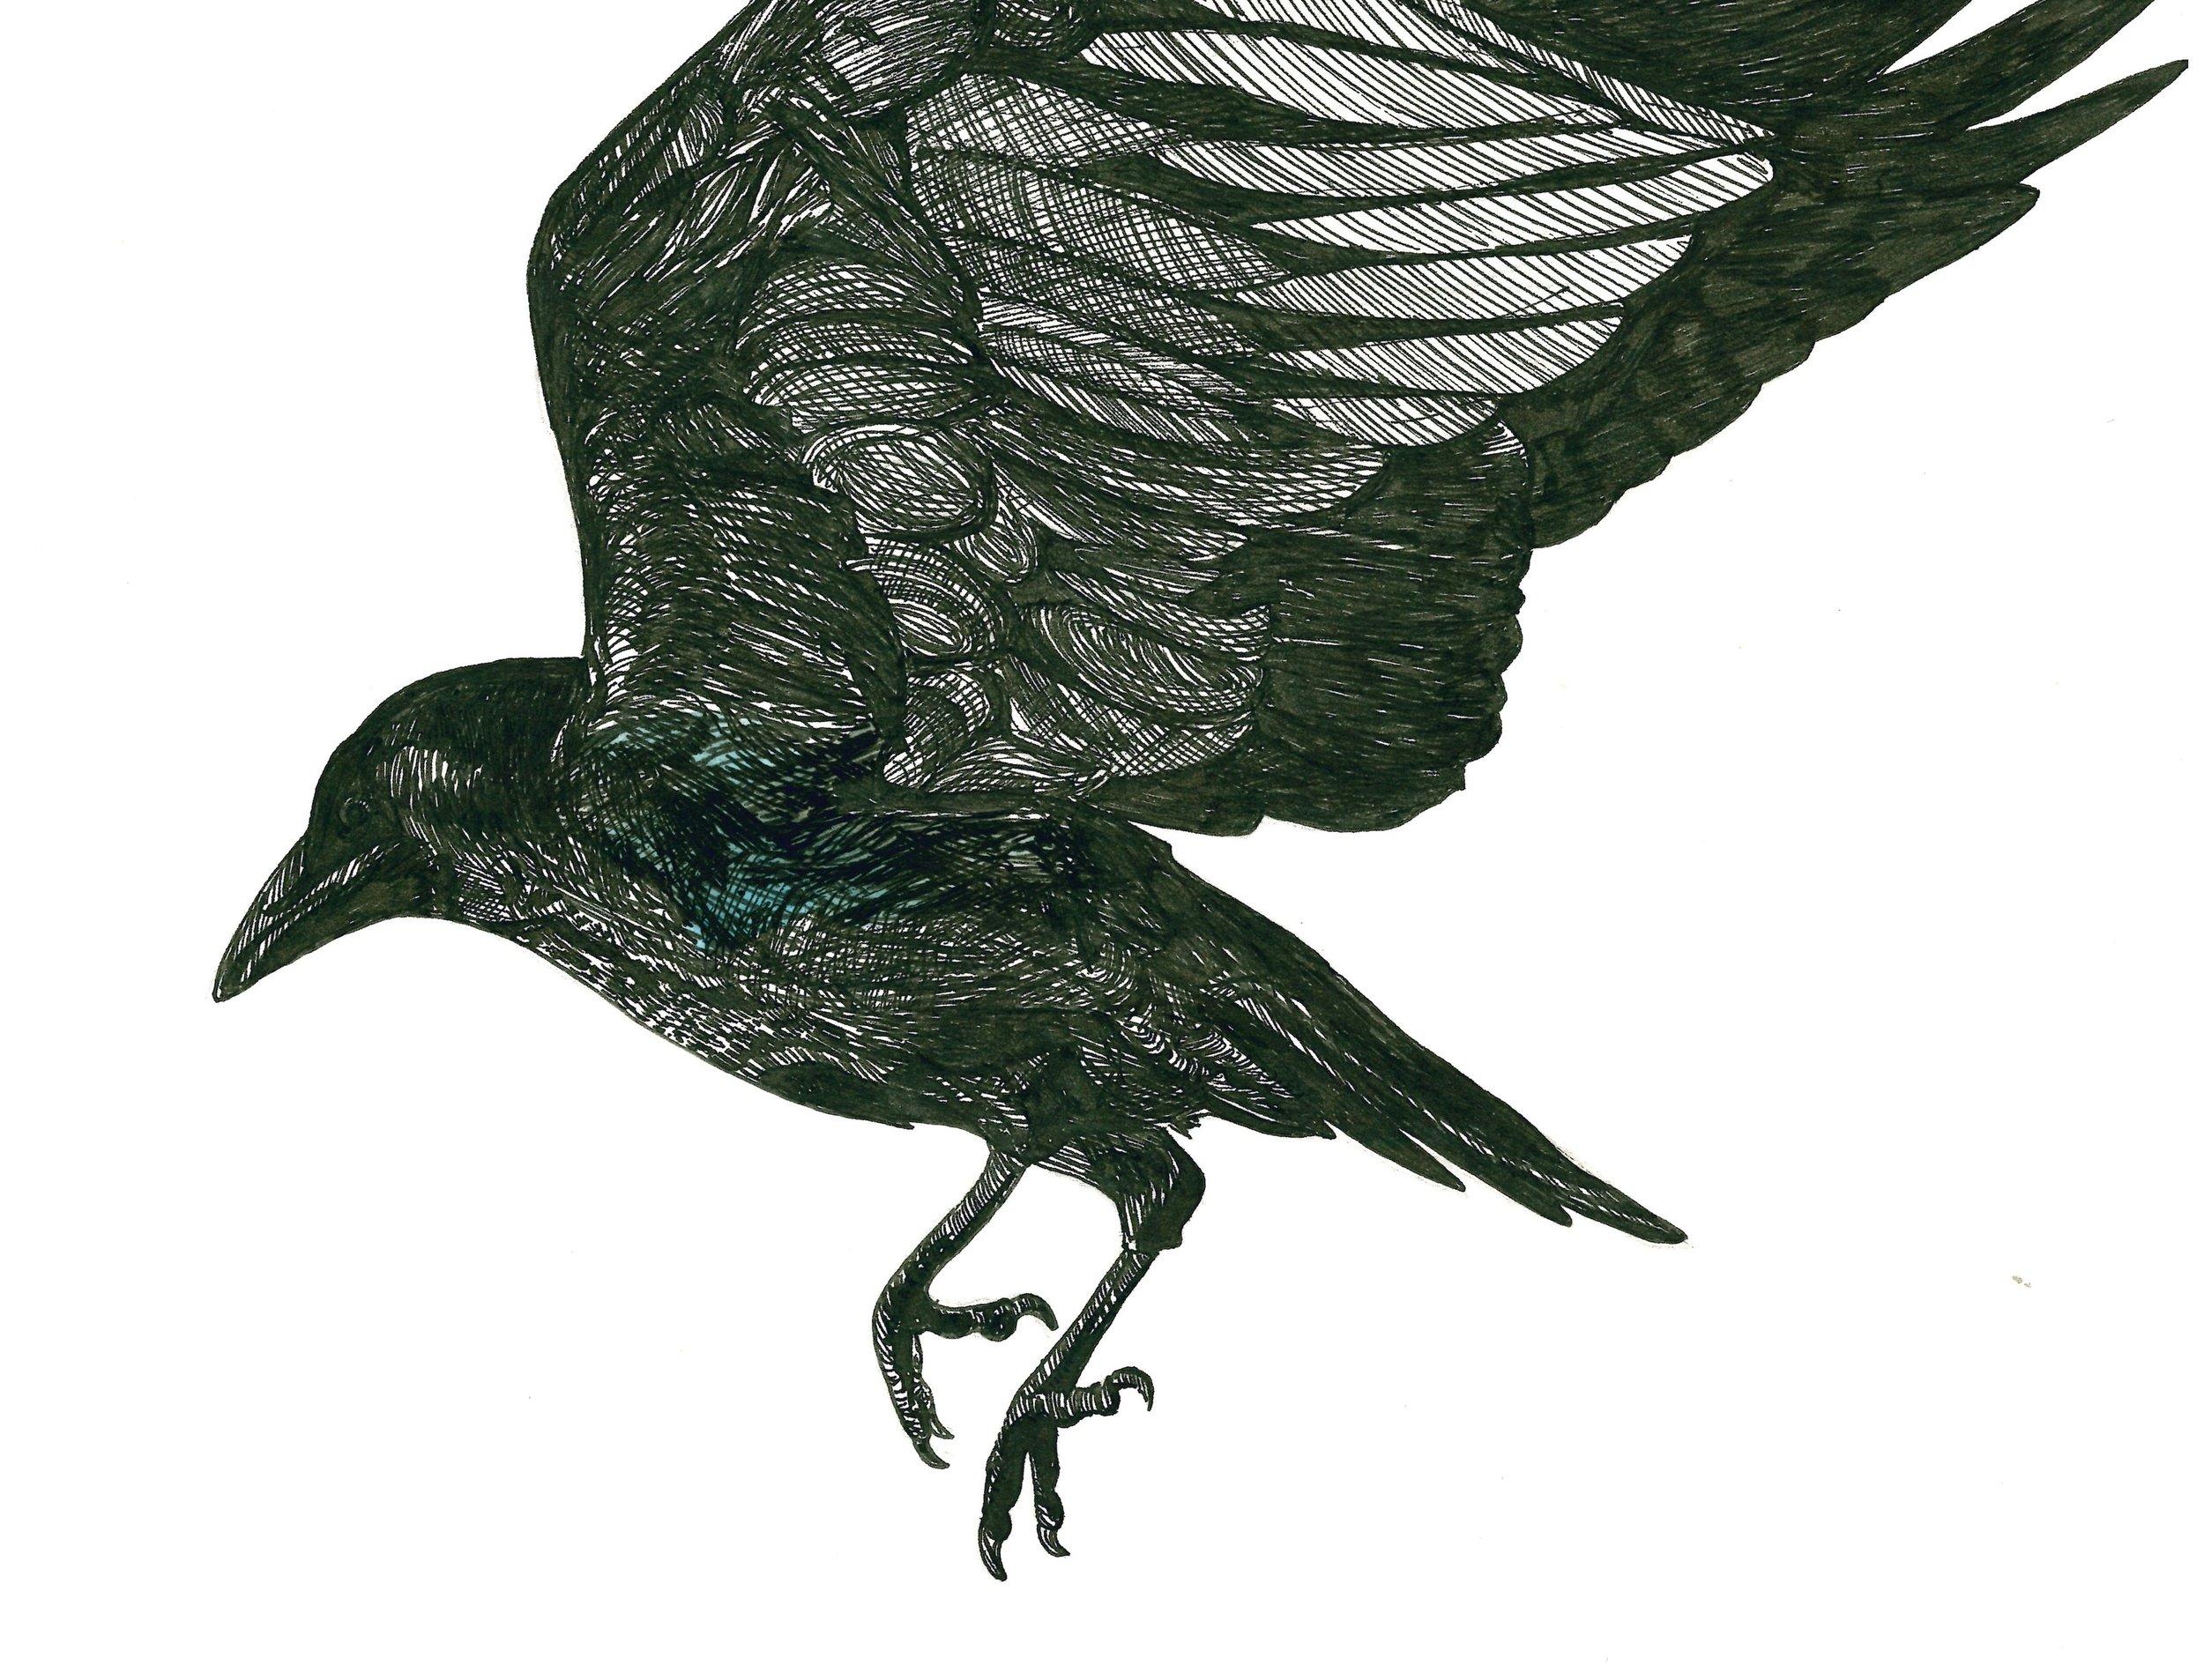 North American Crow .jpeg